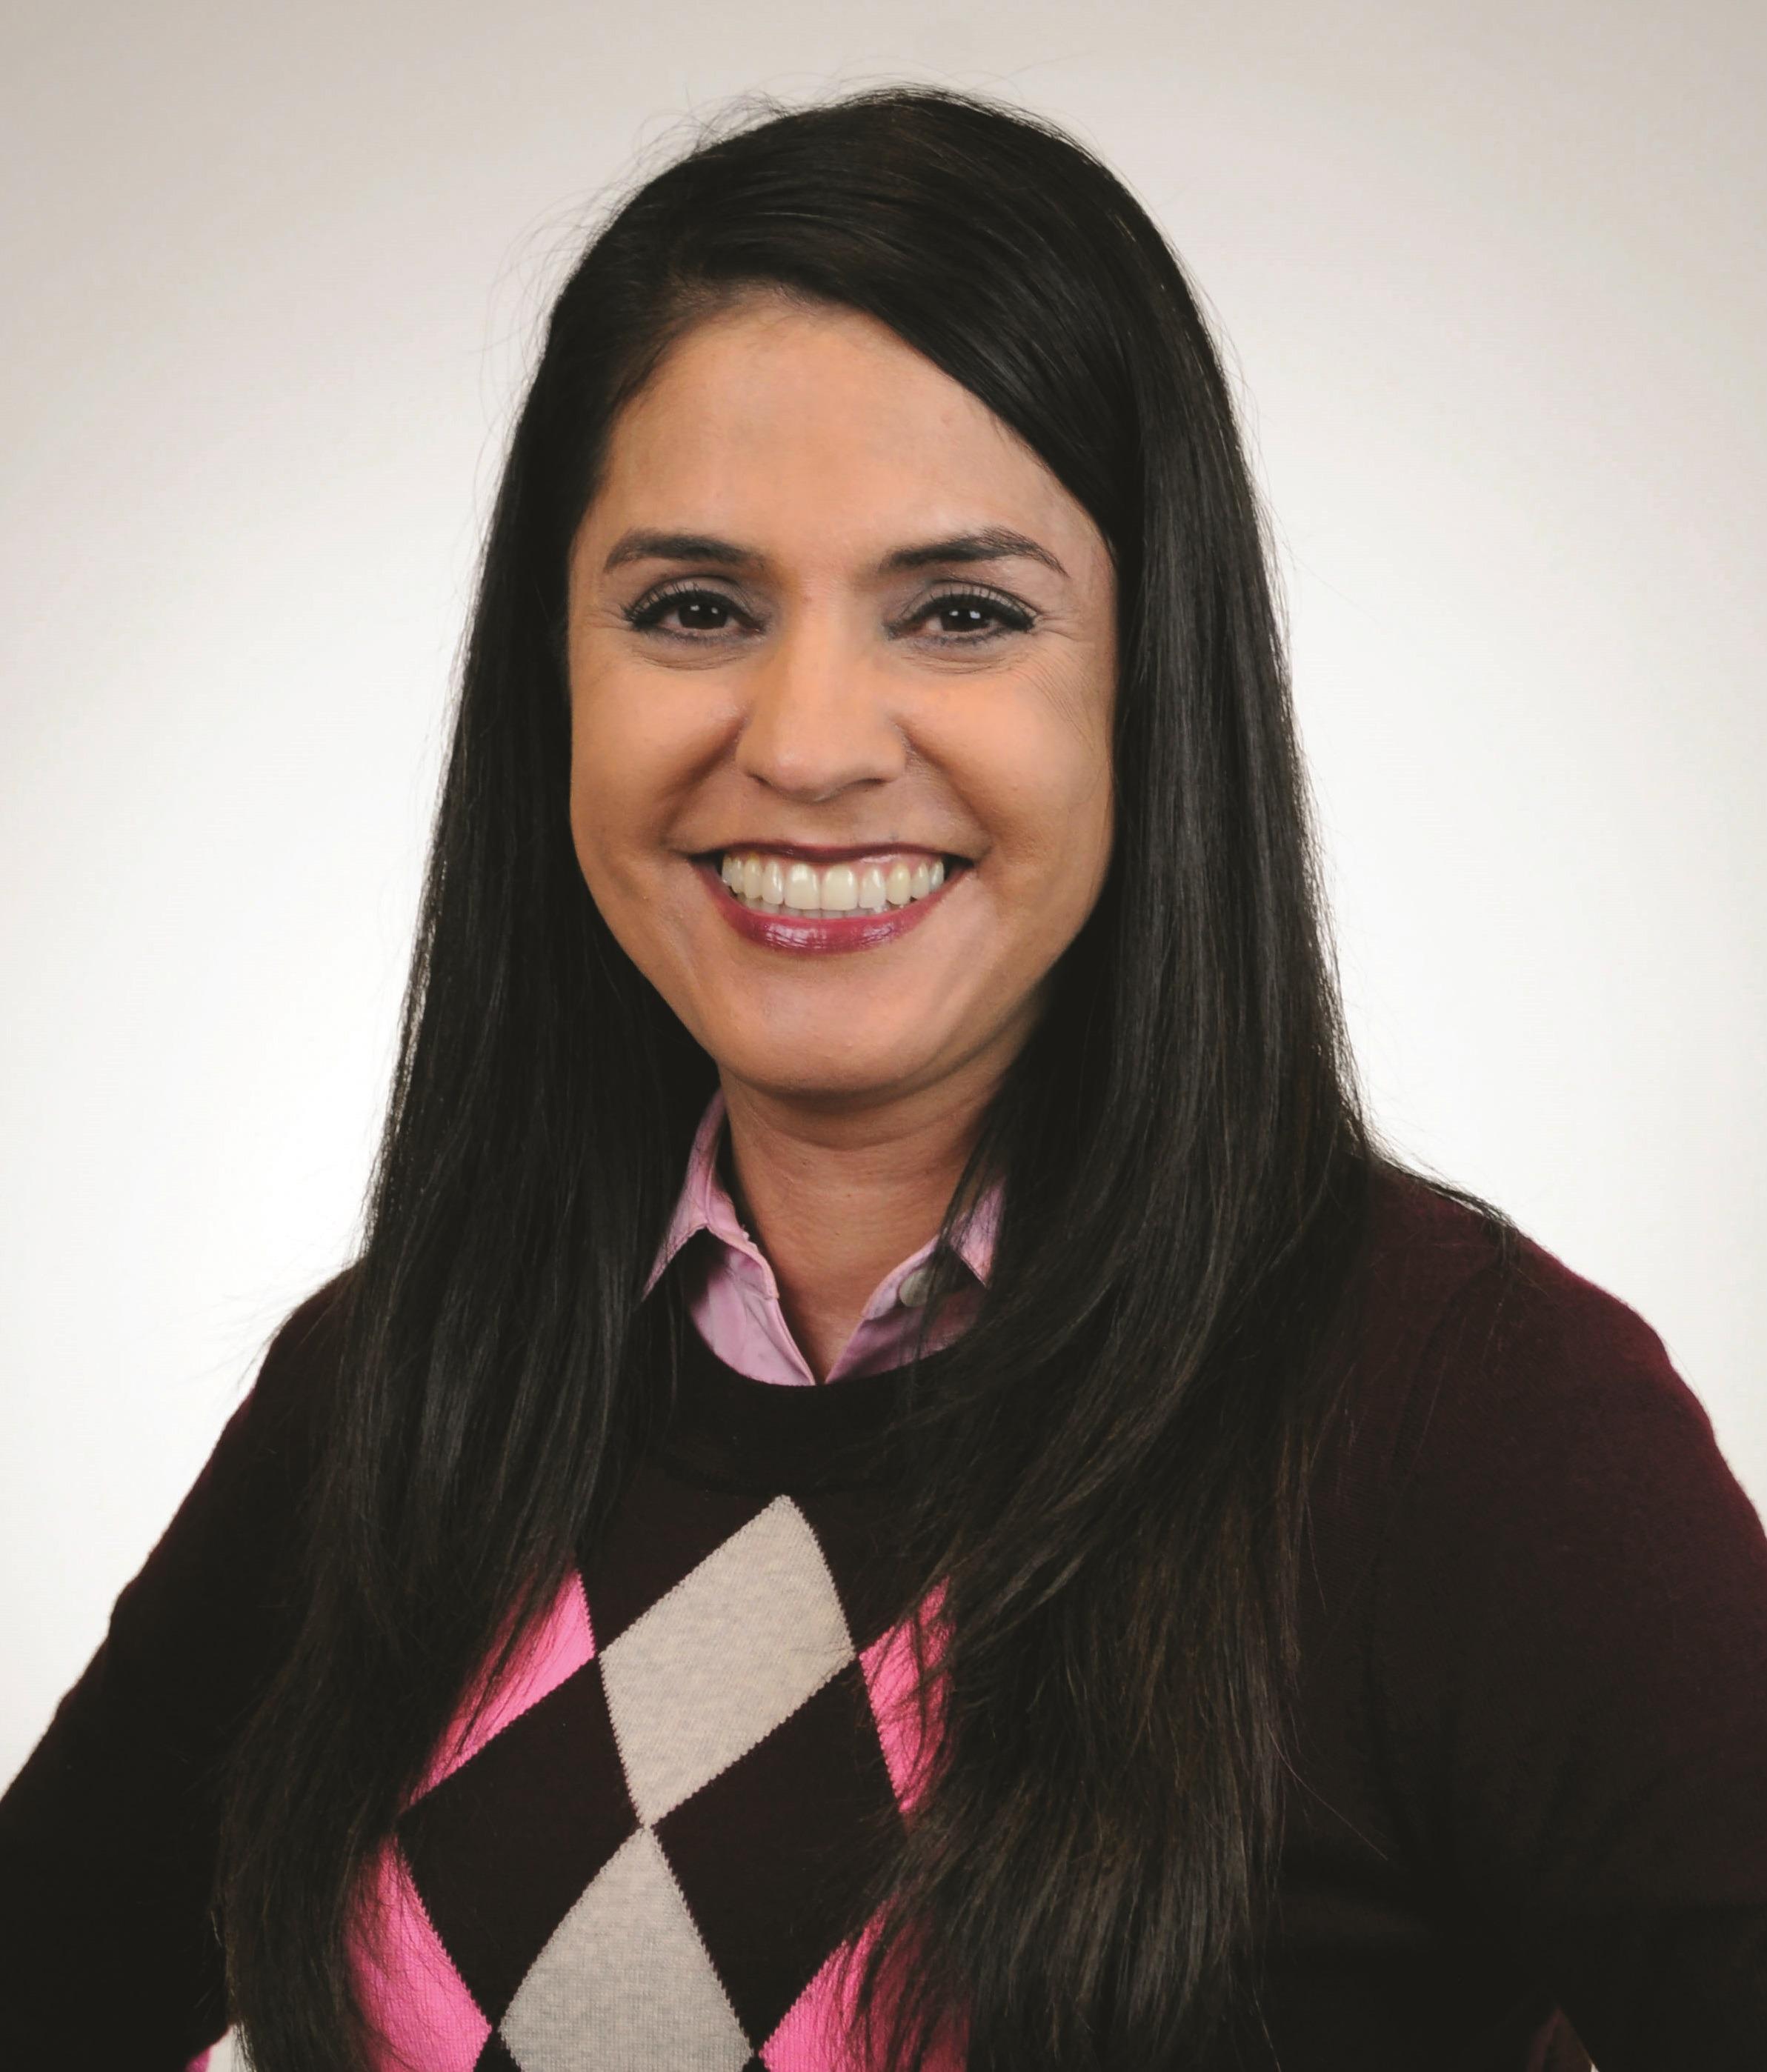 Olivia Amador-Valerio, Corwin, education consulting, CFA 2.0 consultant